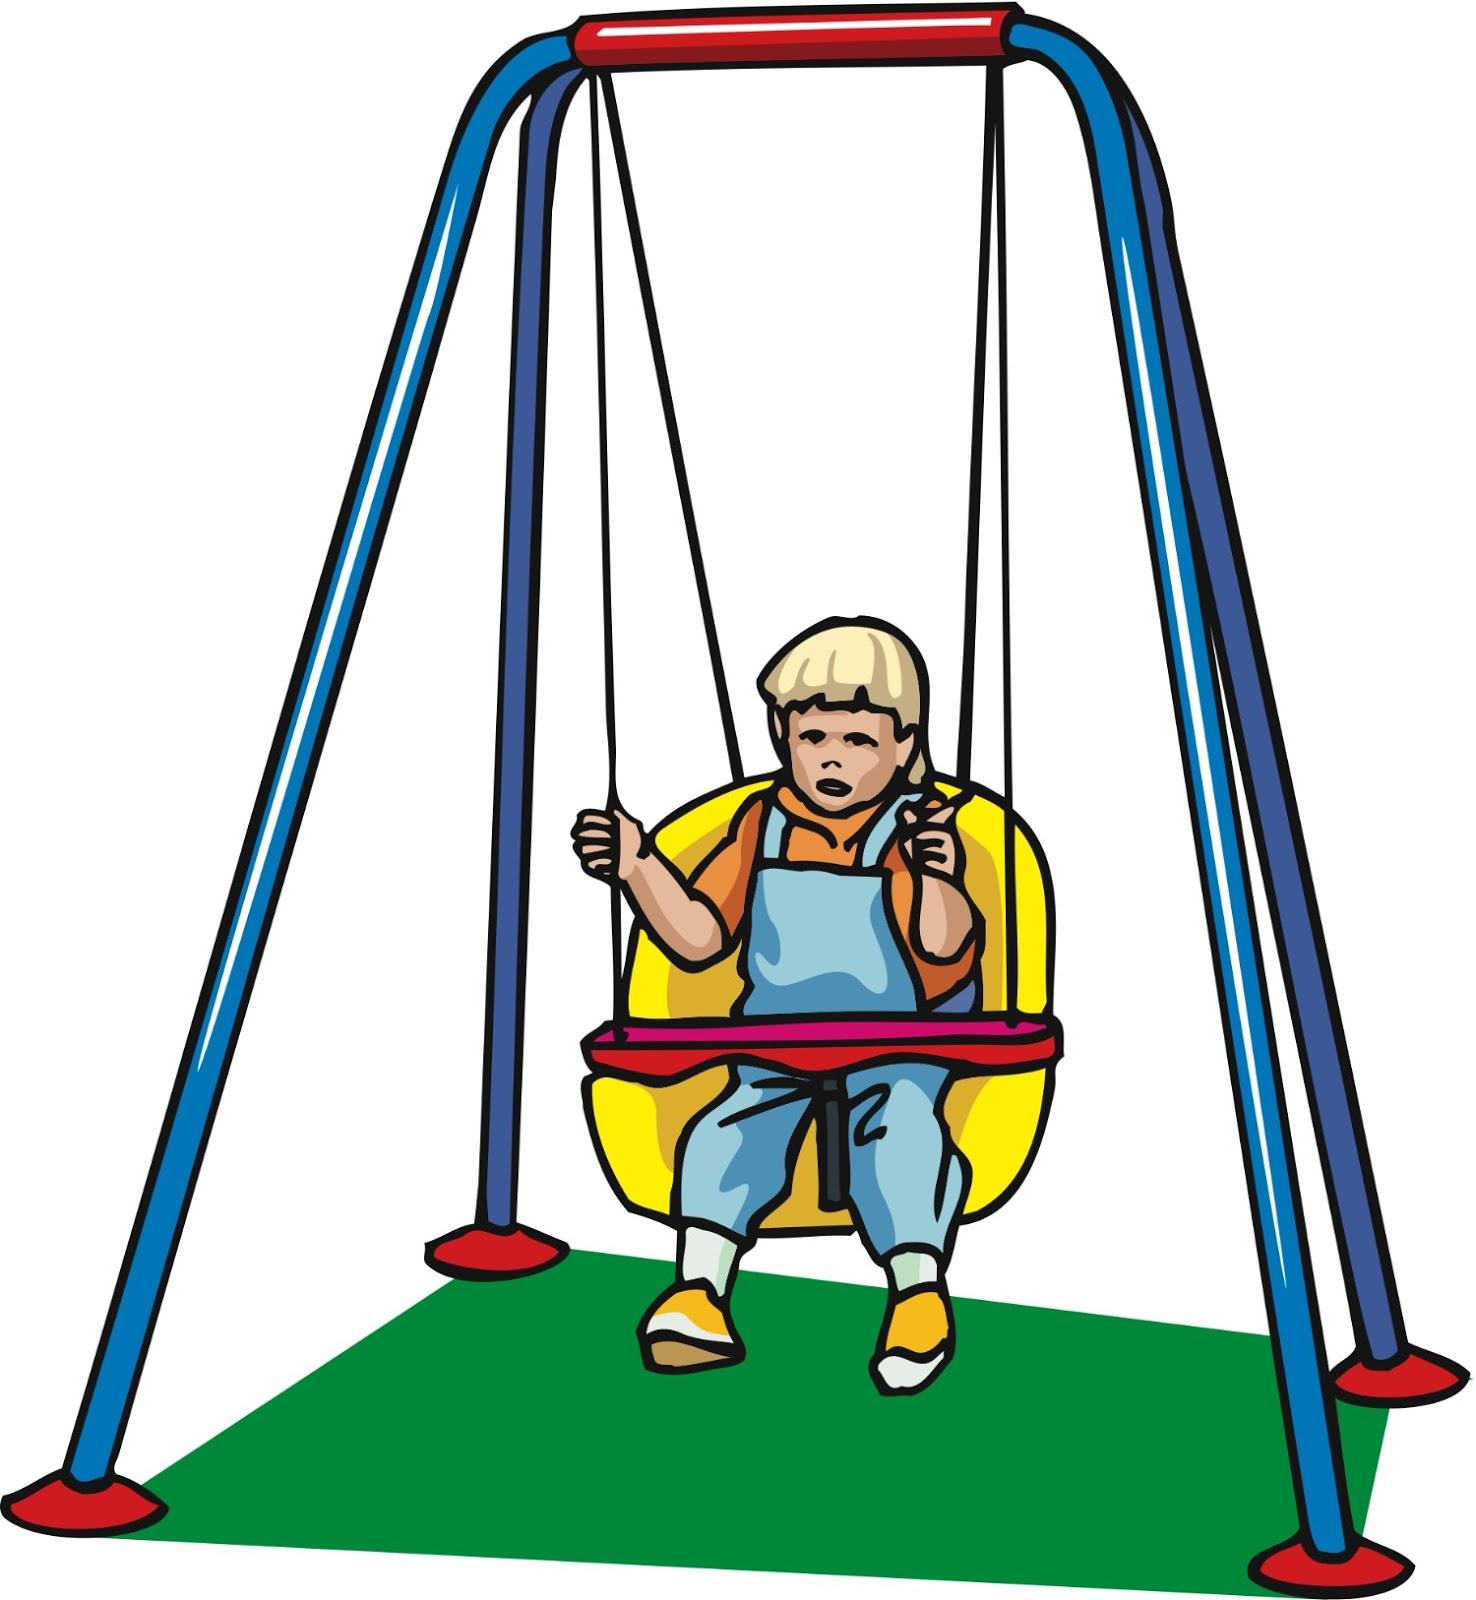 Swing Clip Art - Cliparts.co